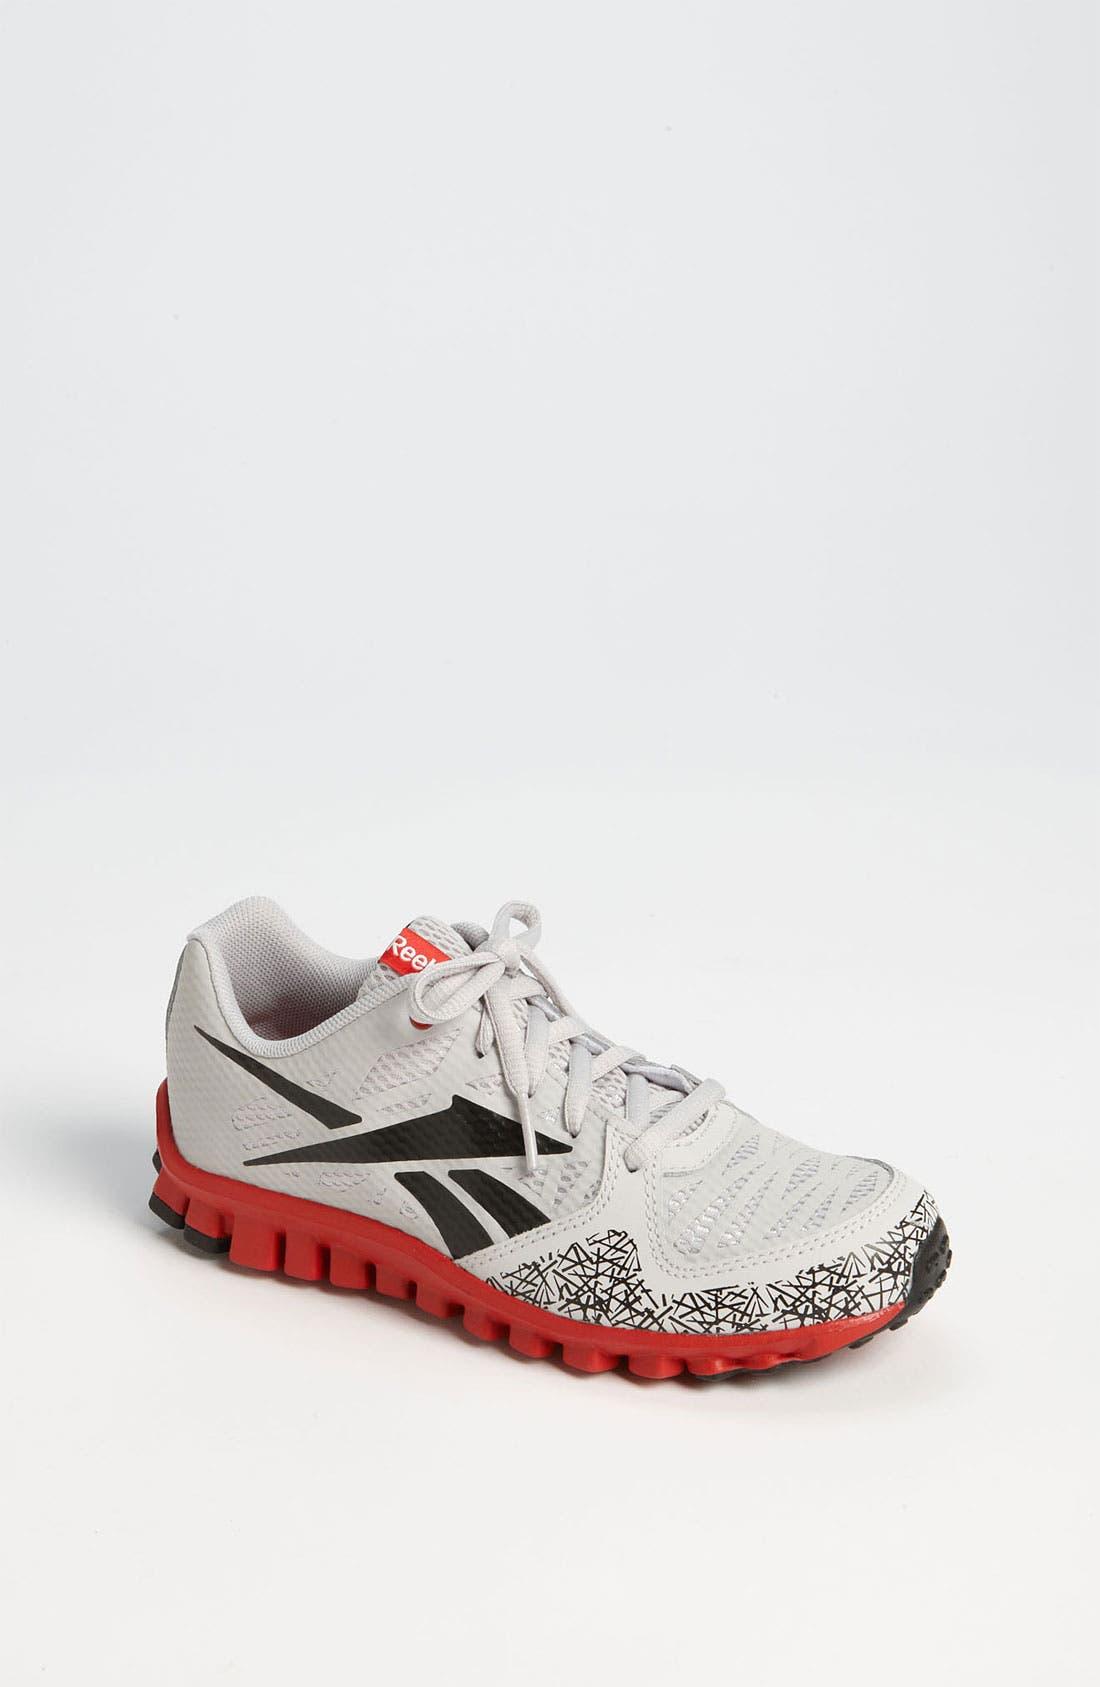 Alternate Image 1 Selected - Reebok 'RealFlex Transition 2.0' Sneaker (Toddler, Little Kid & Big Kid)